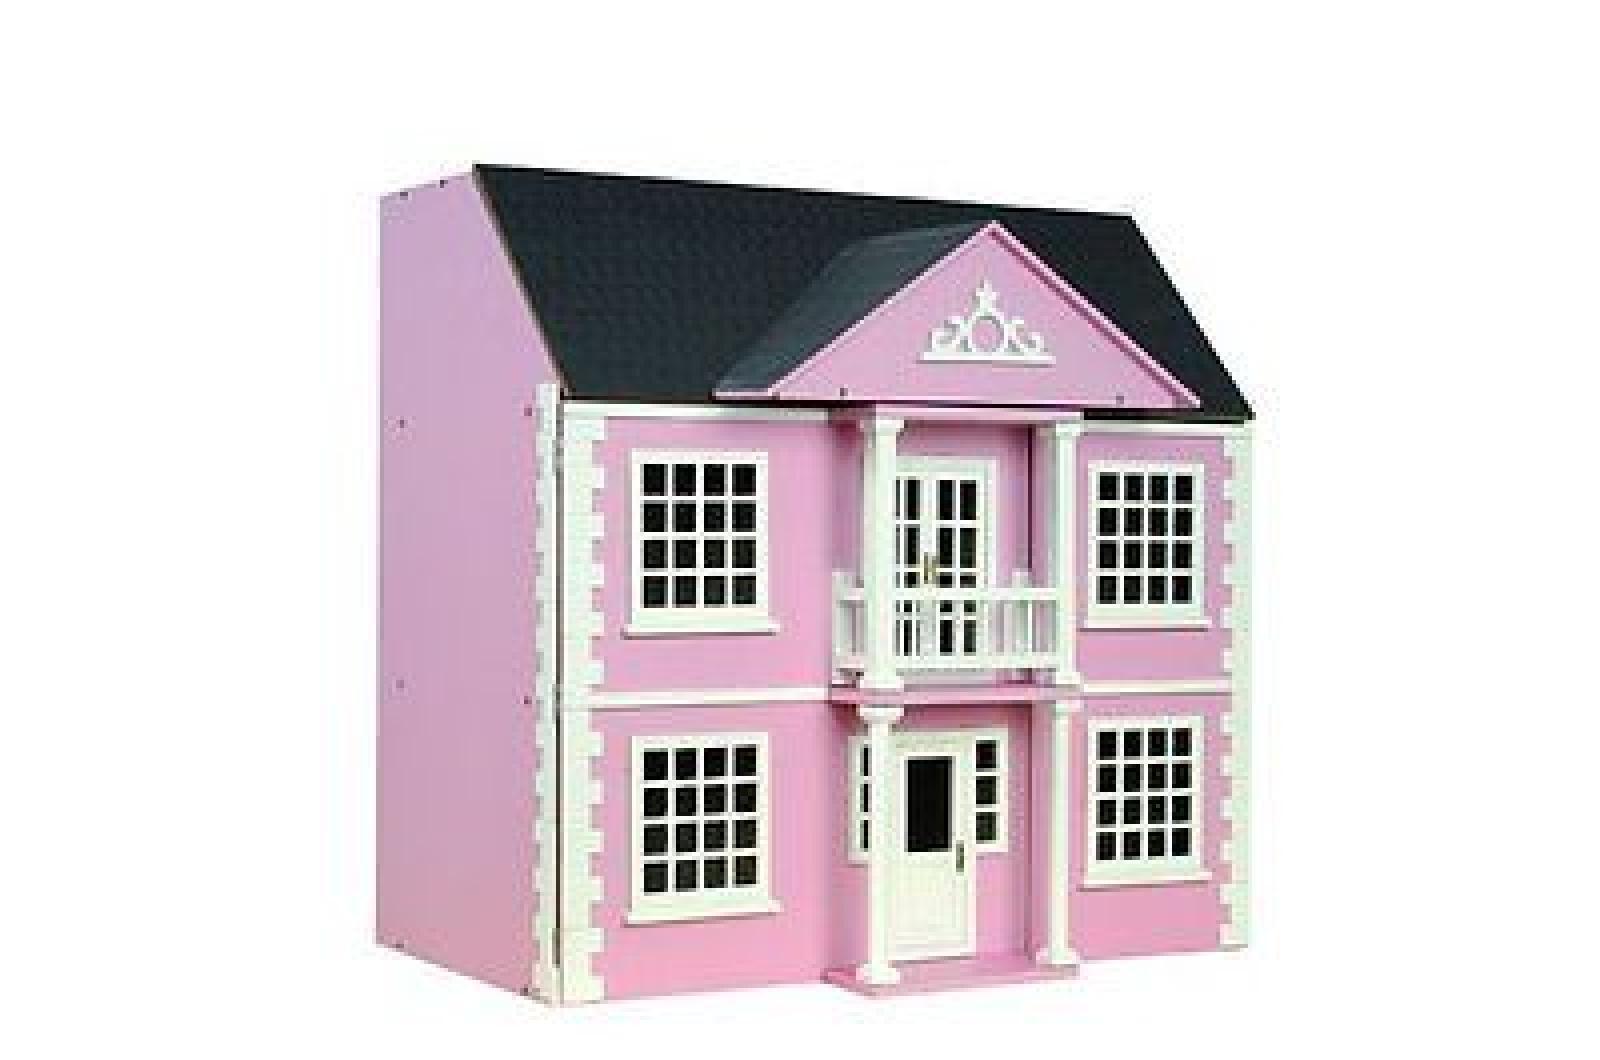 Dolls House. Nuovonham Manor, Streets Ahead. DH033P esterno decorato GRATIS P&P